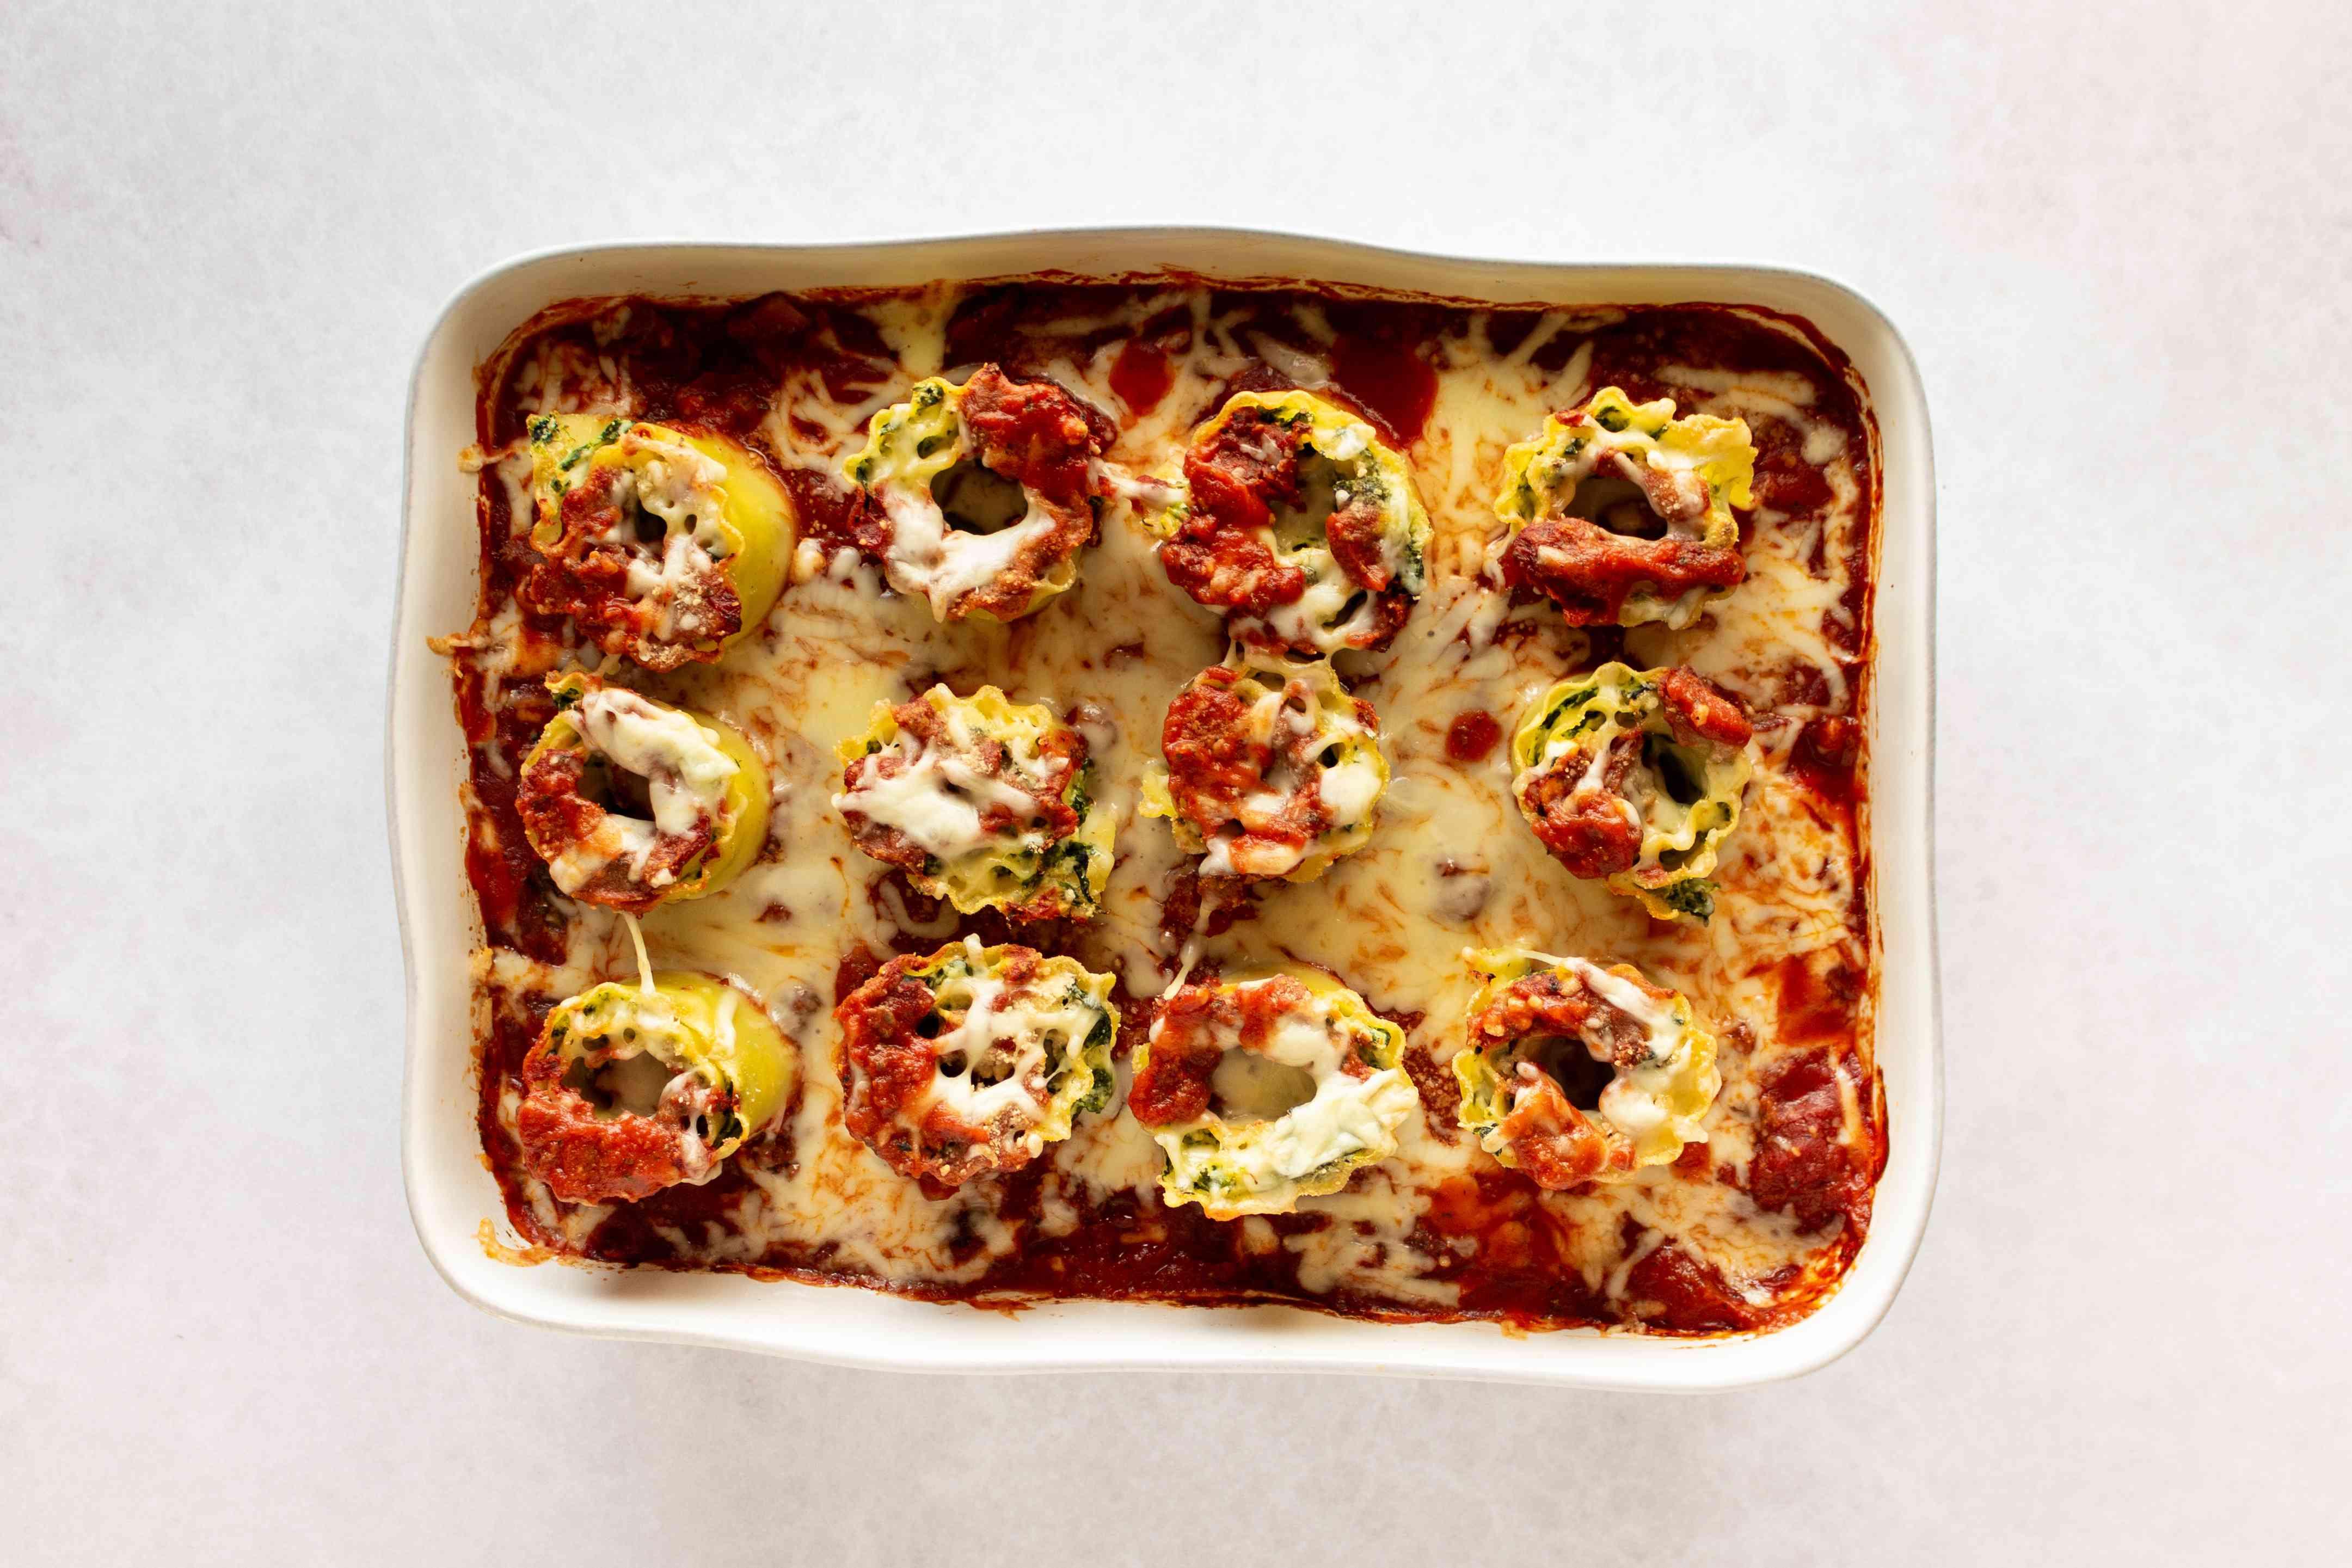 Spinach Lasagna Roll-Ups in baking dish